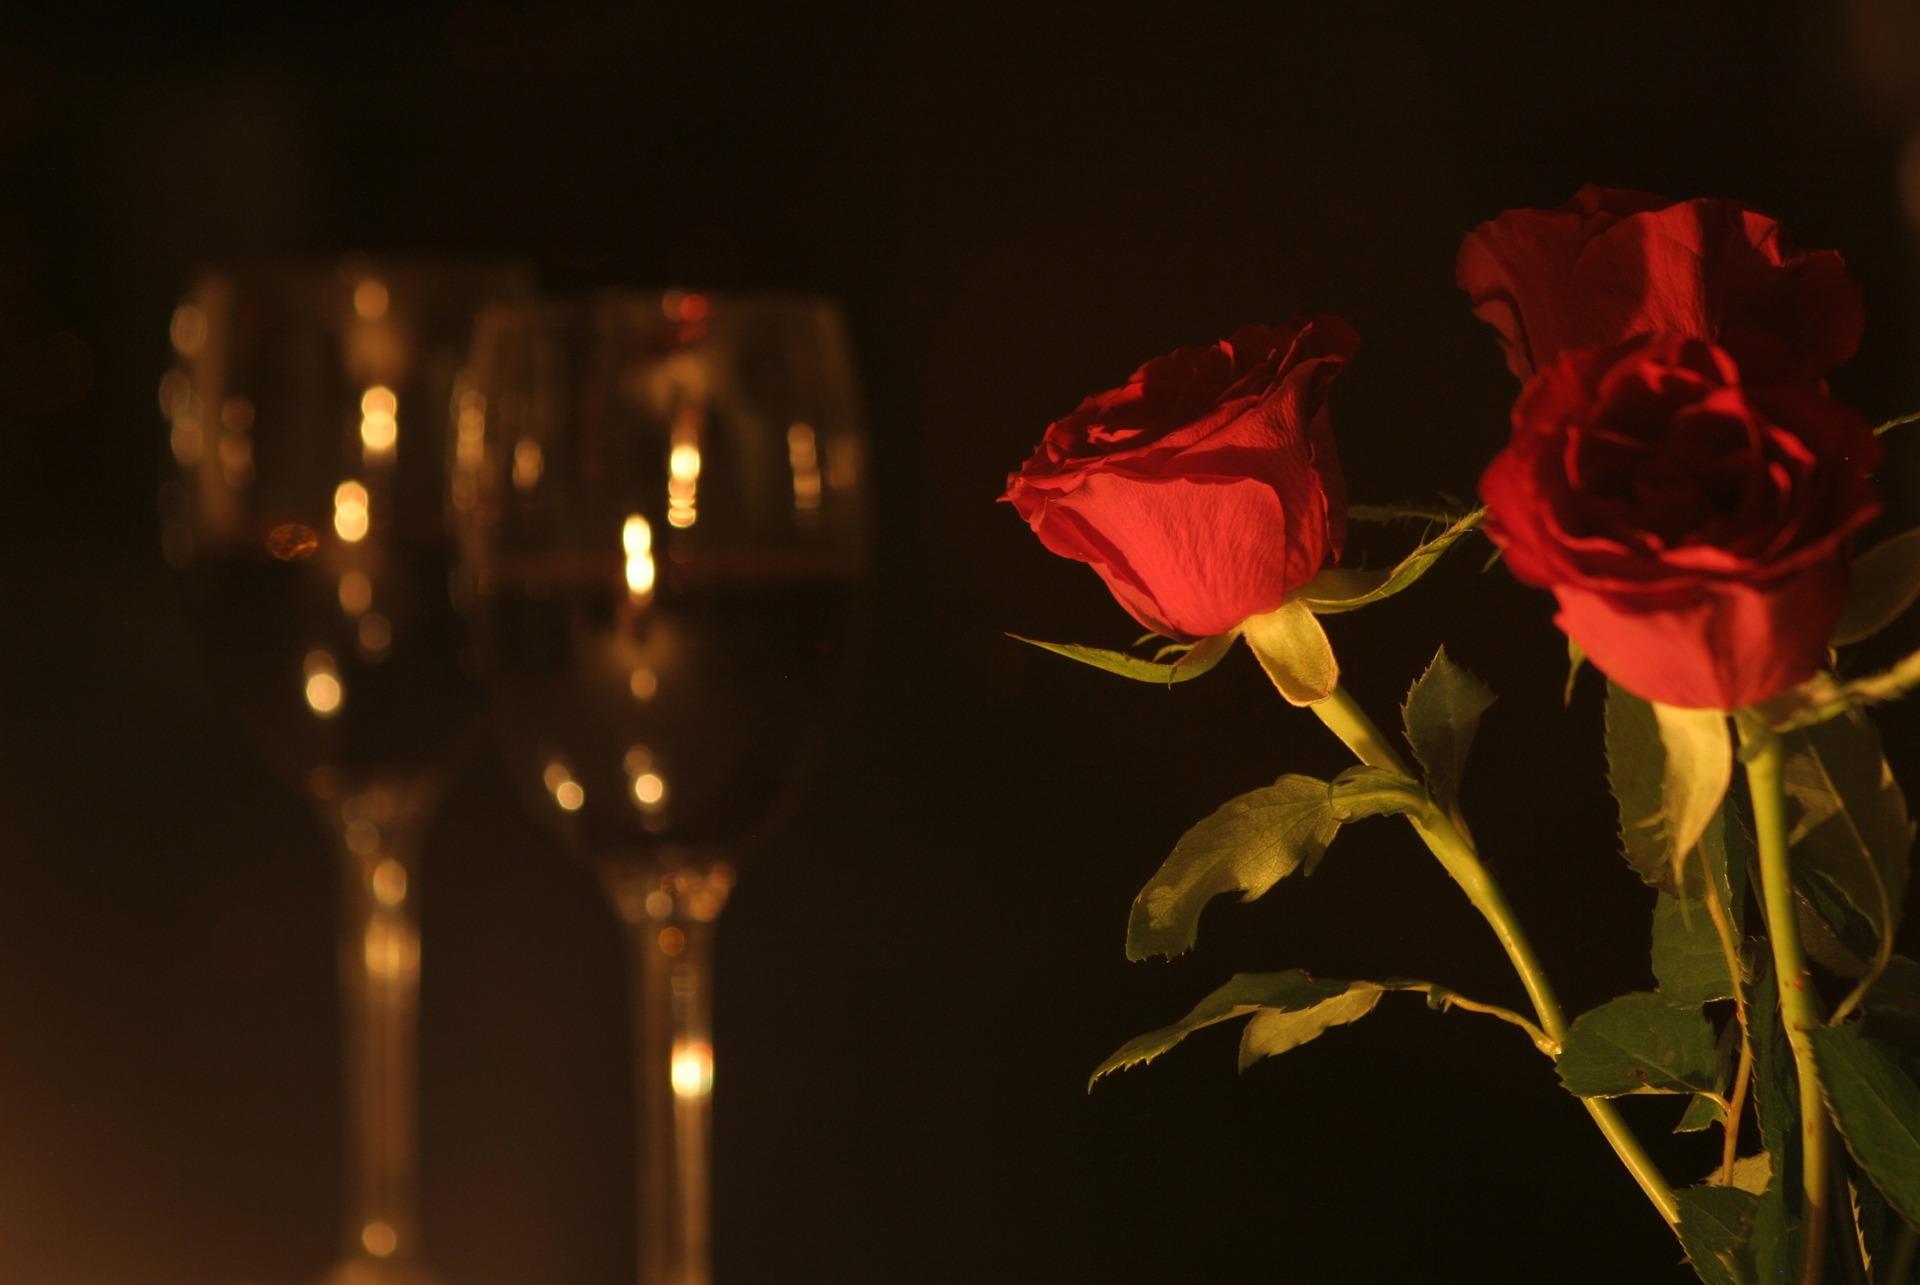 romantic-dinner-3948089_1920